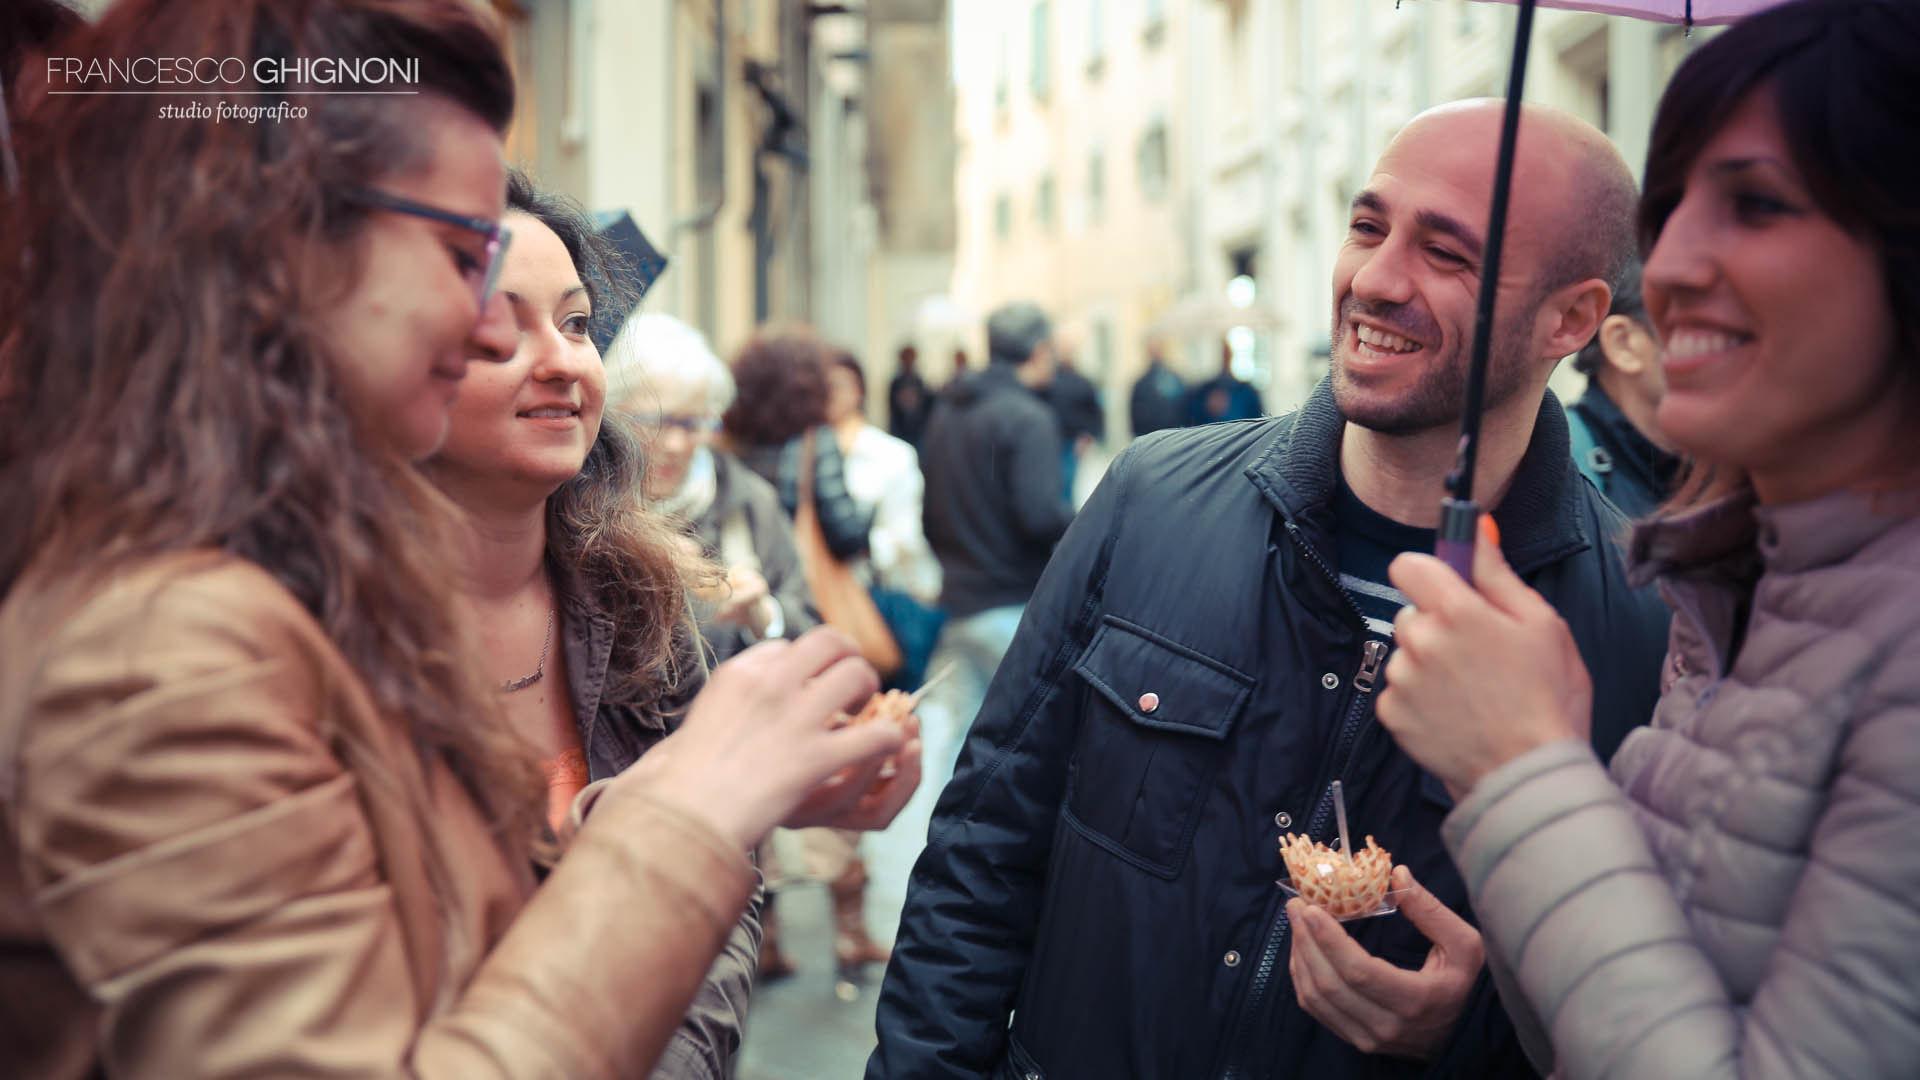 140427171538 - Foto Francesco Ghignoni